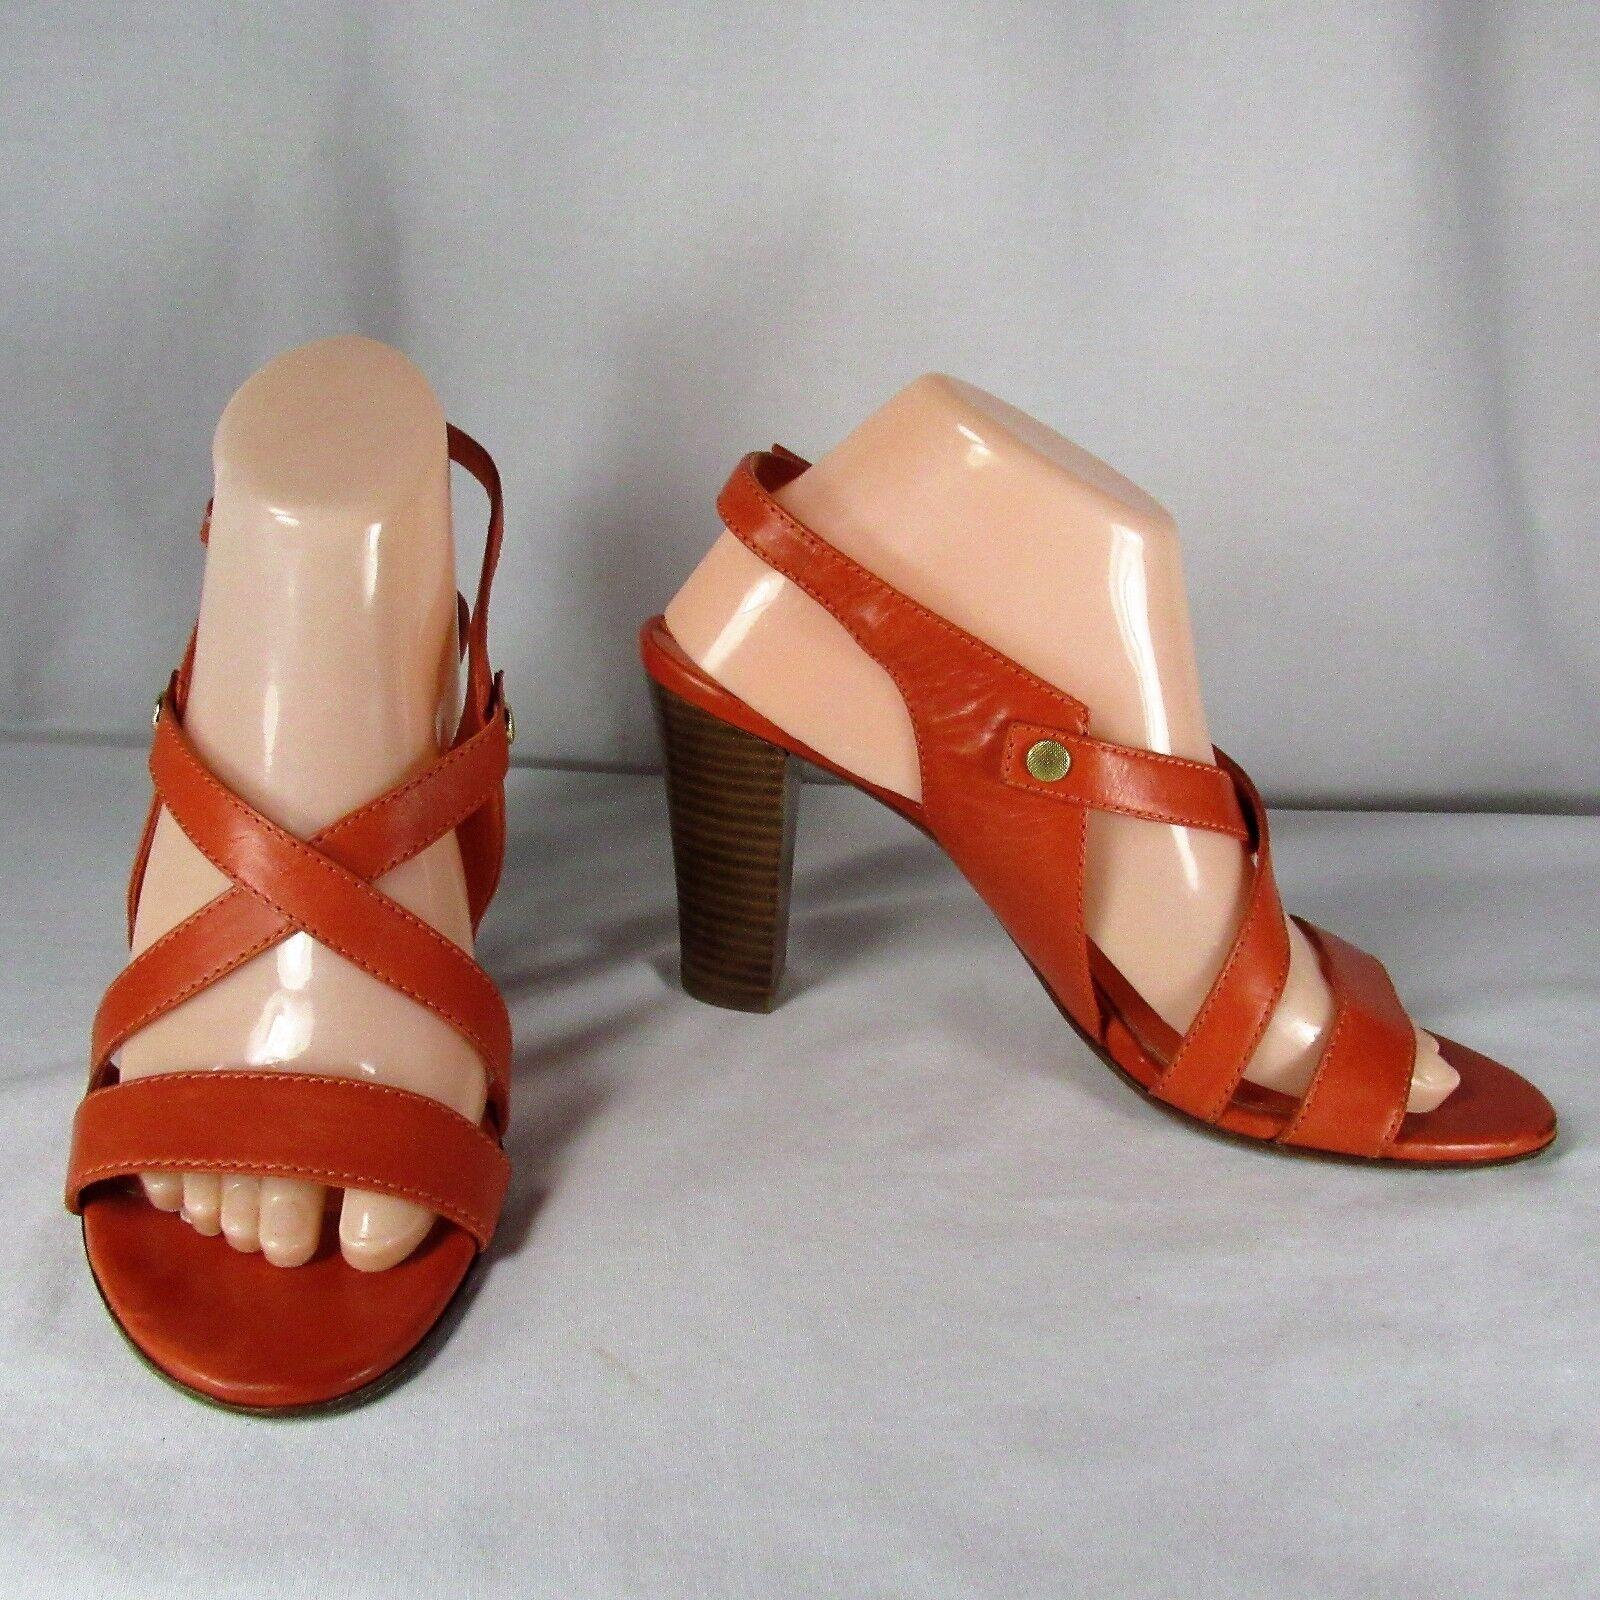 Via Spiga 9 M Orange Leder Sandales Strappy Open Toe Slingback 4